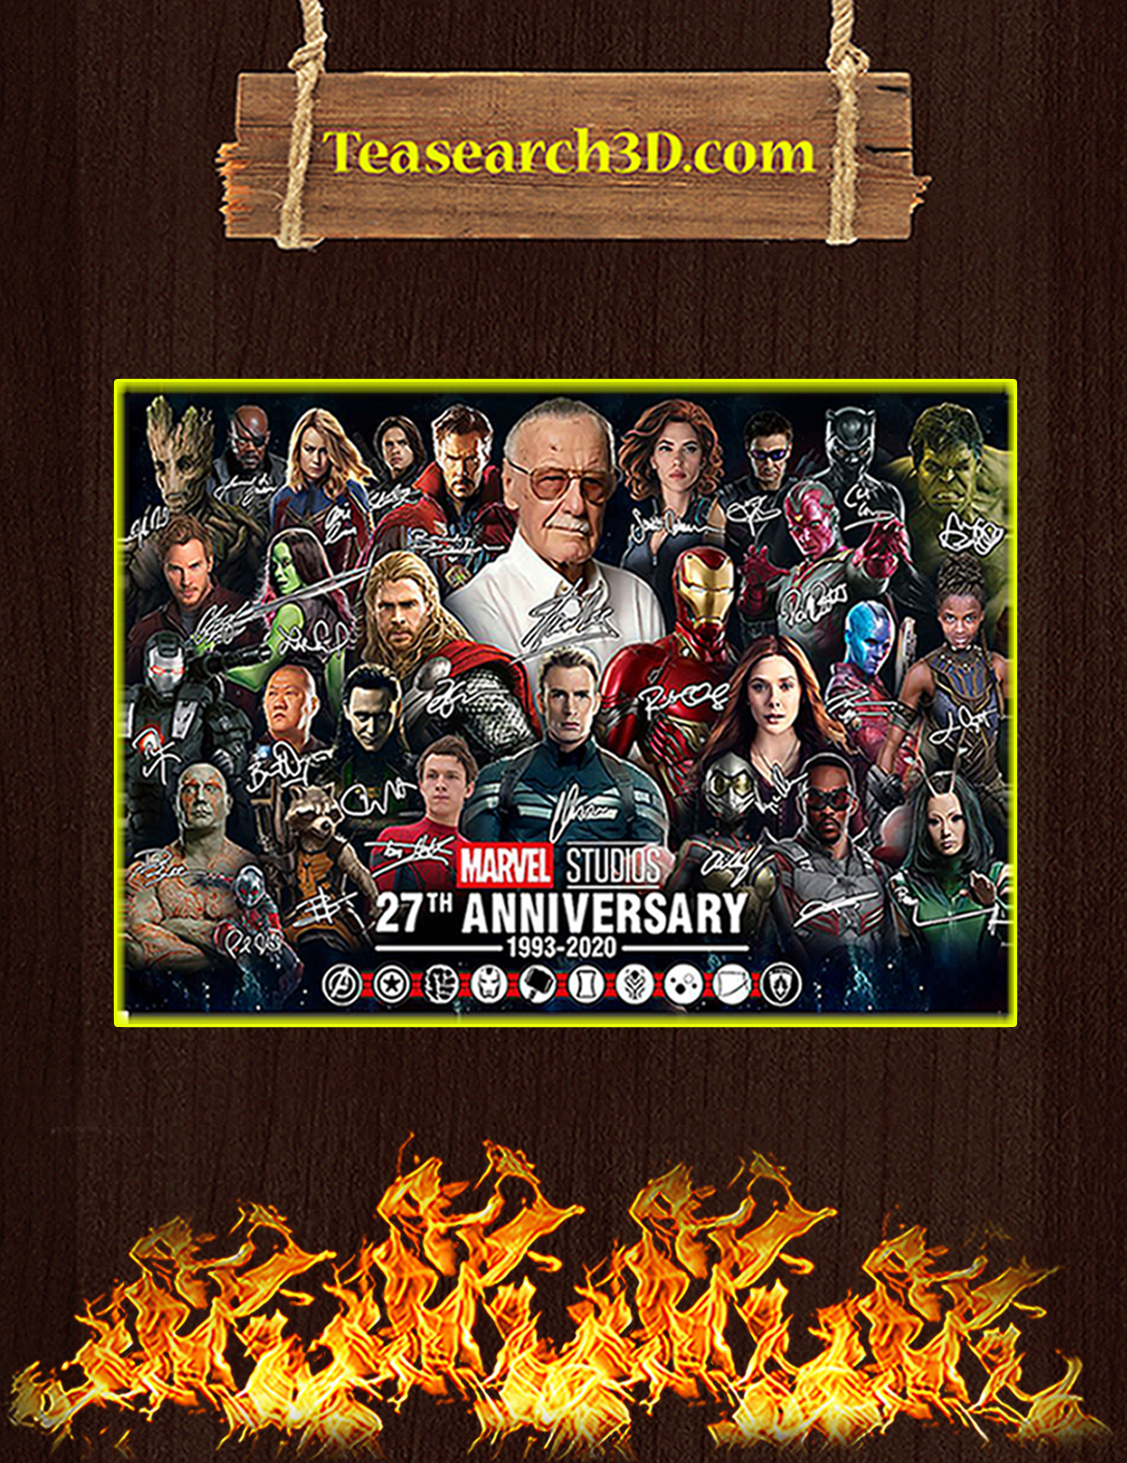 Marvel studios 27th anniversary signature poster A3